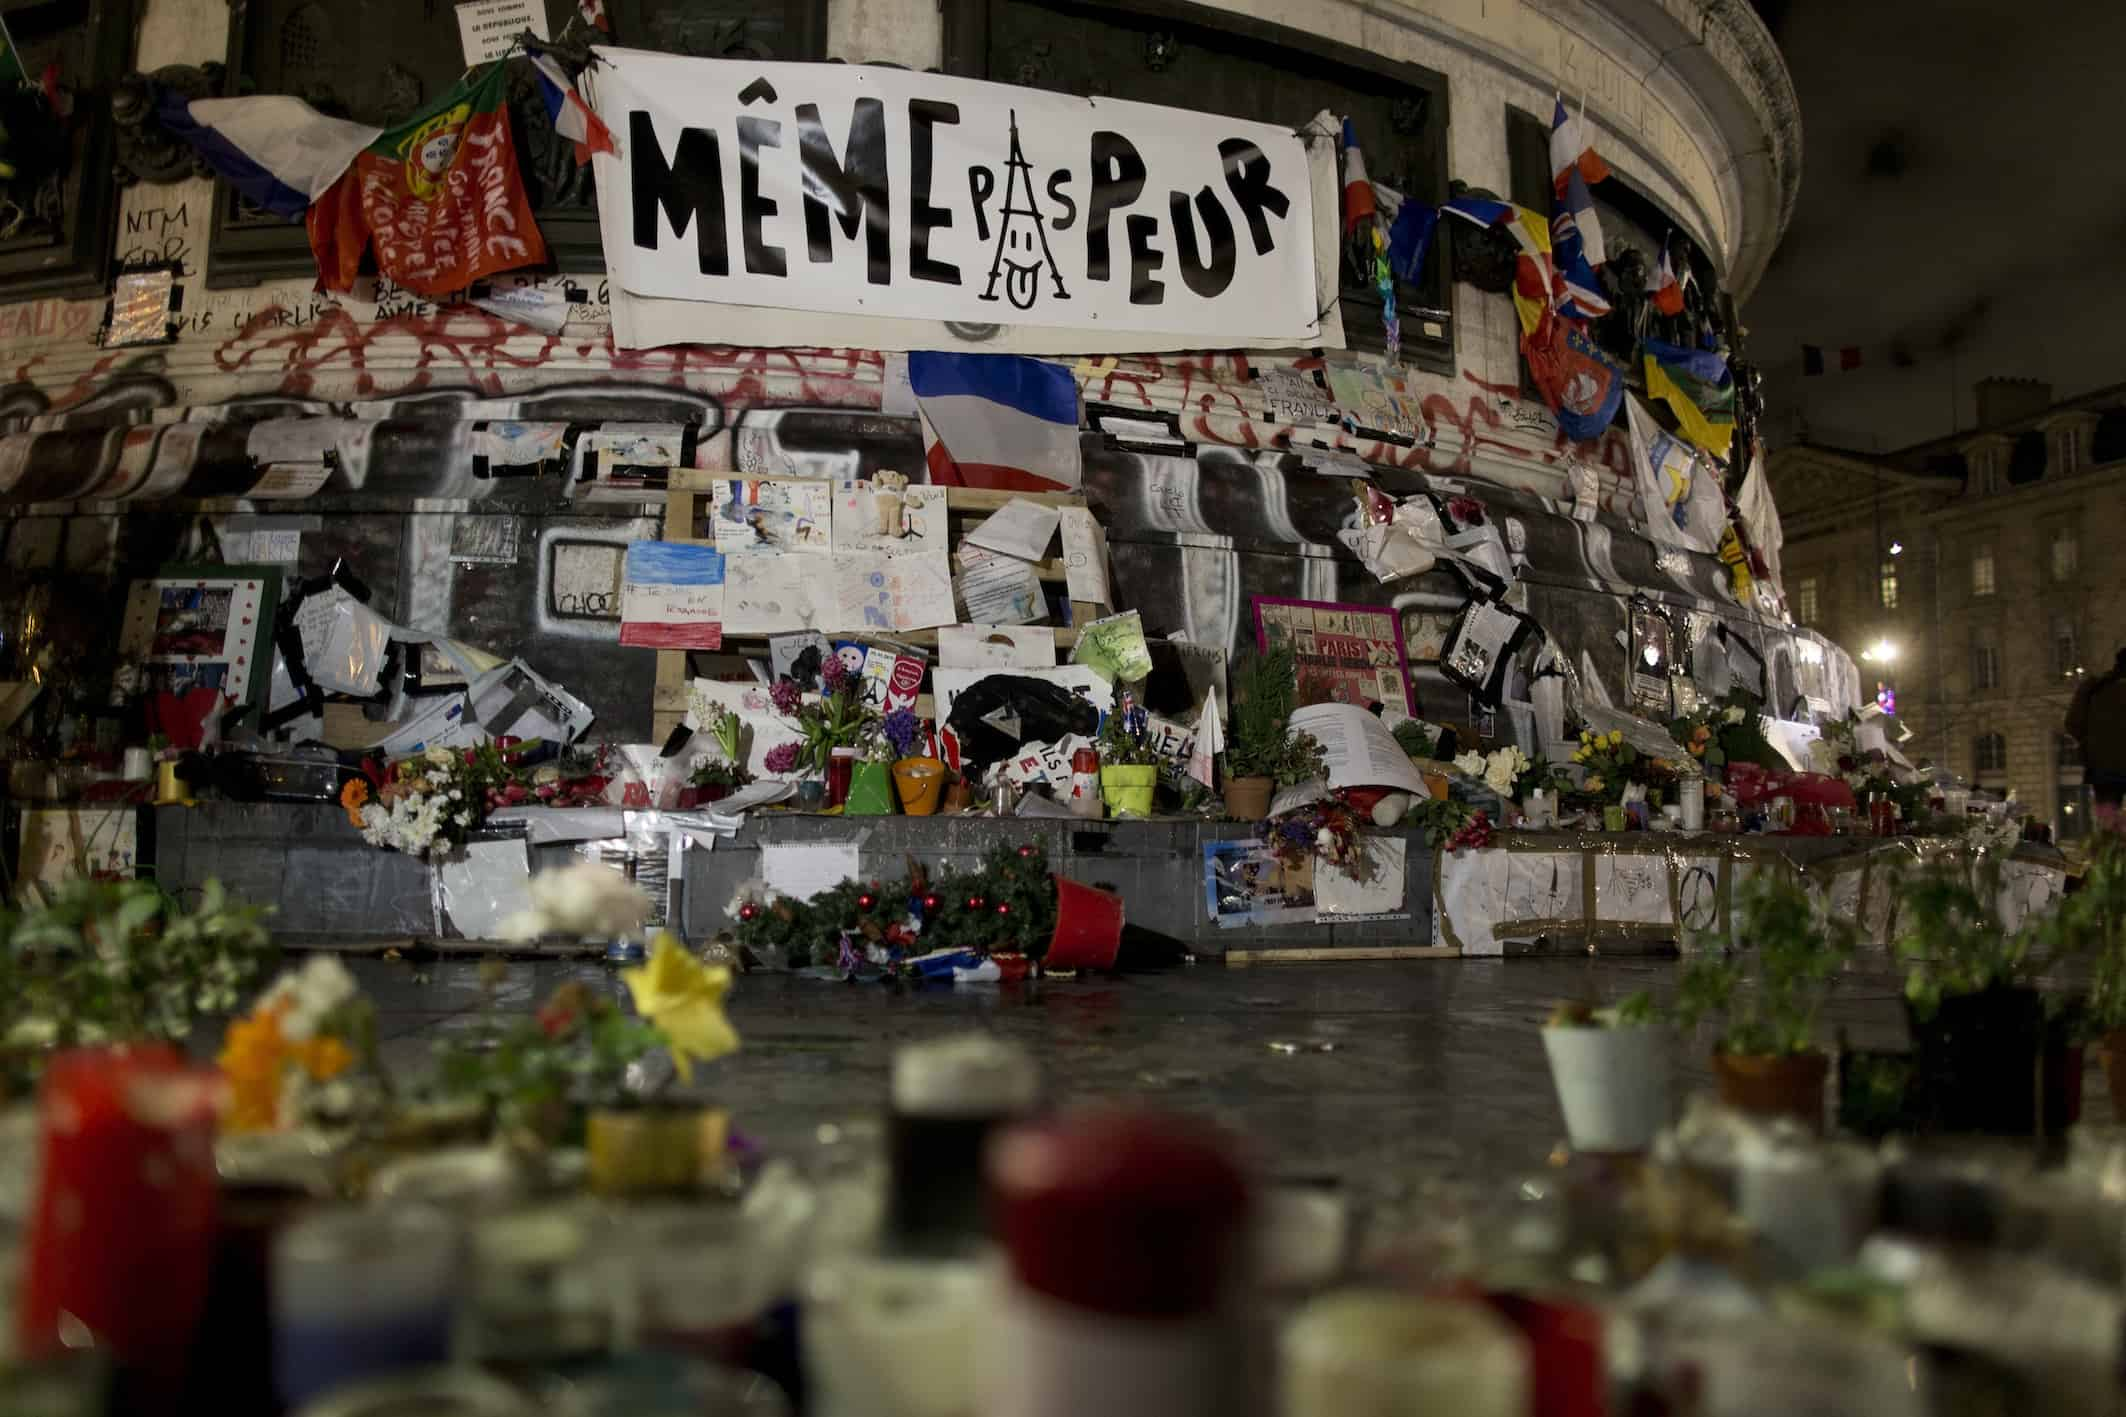 Charlie Hebdo anniversary memorial